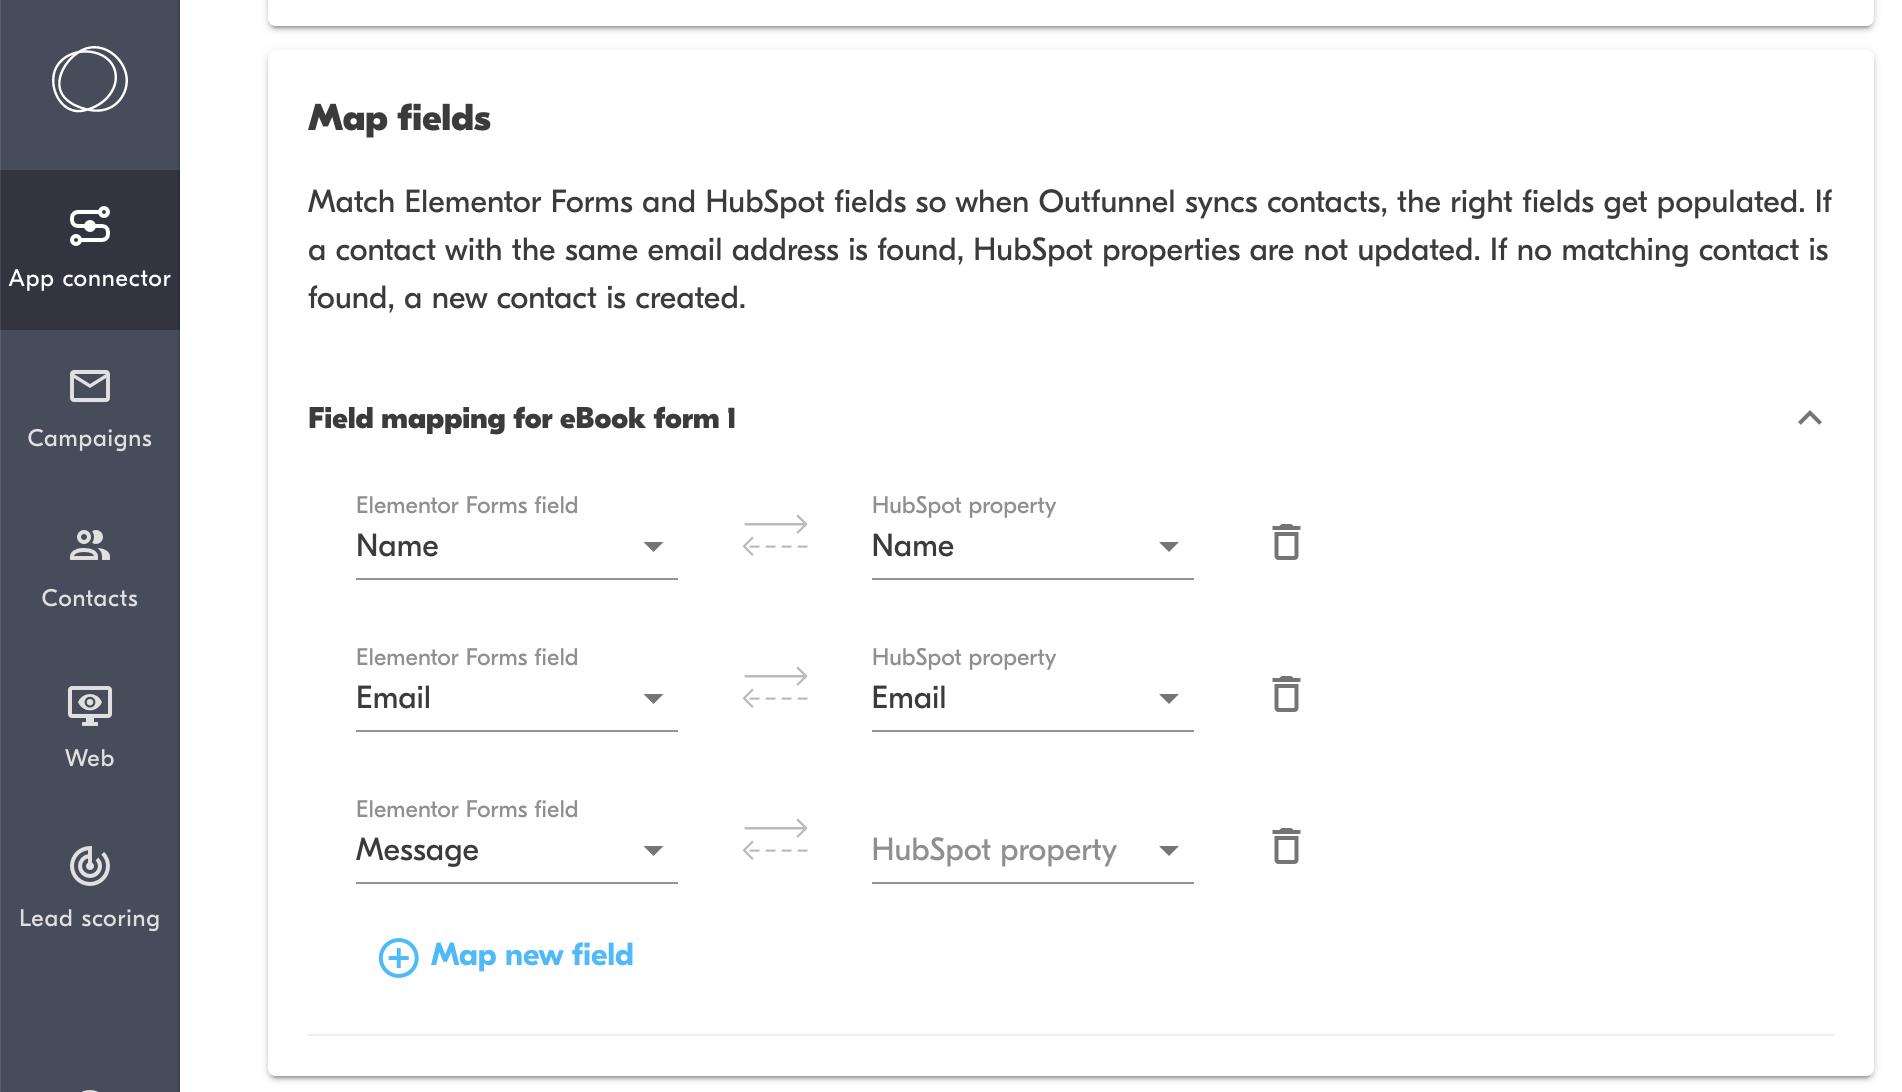 map fields between elementor forms and hubspot